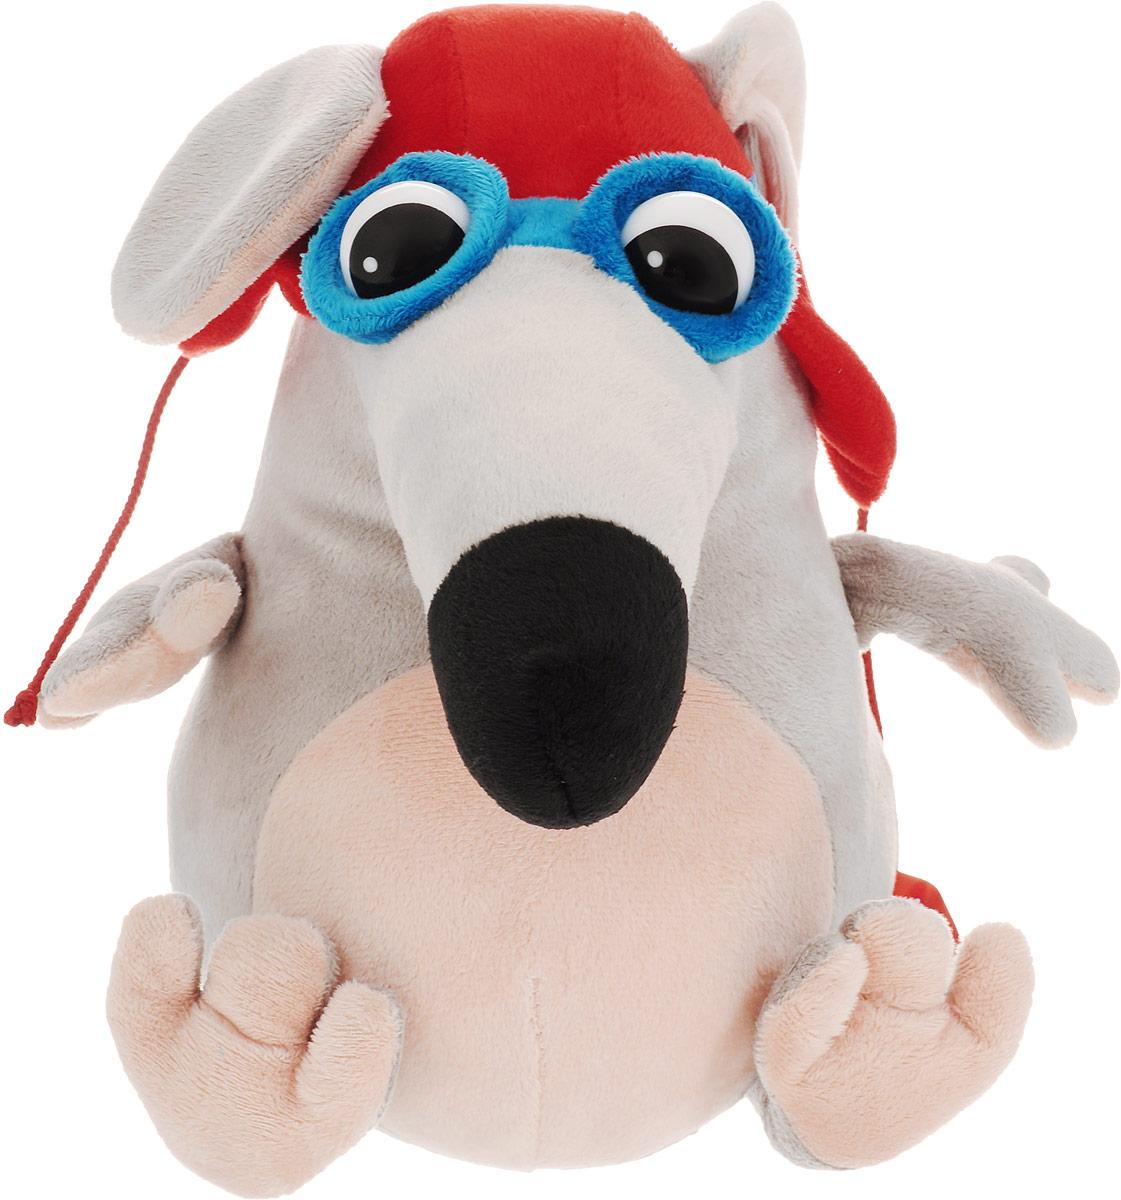 Fancy Мягкая игрушка Мышка Пилот 23 см fancy мягкая игрушка собака соня 70 см